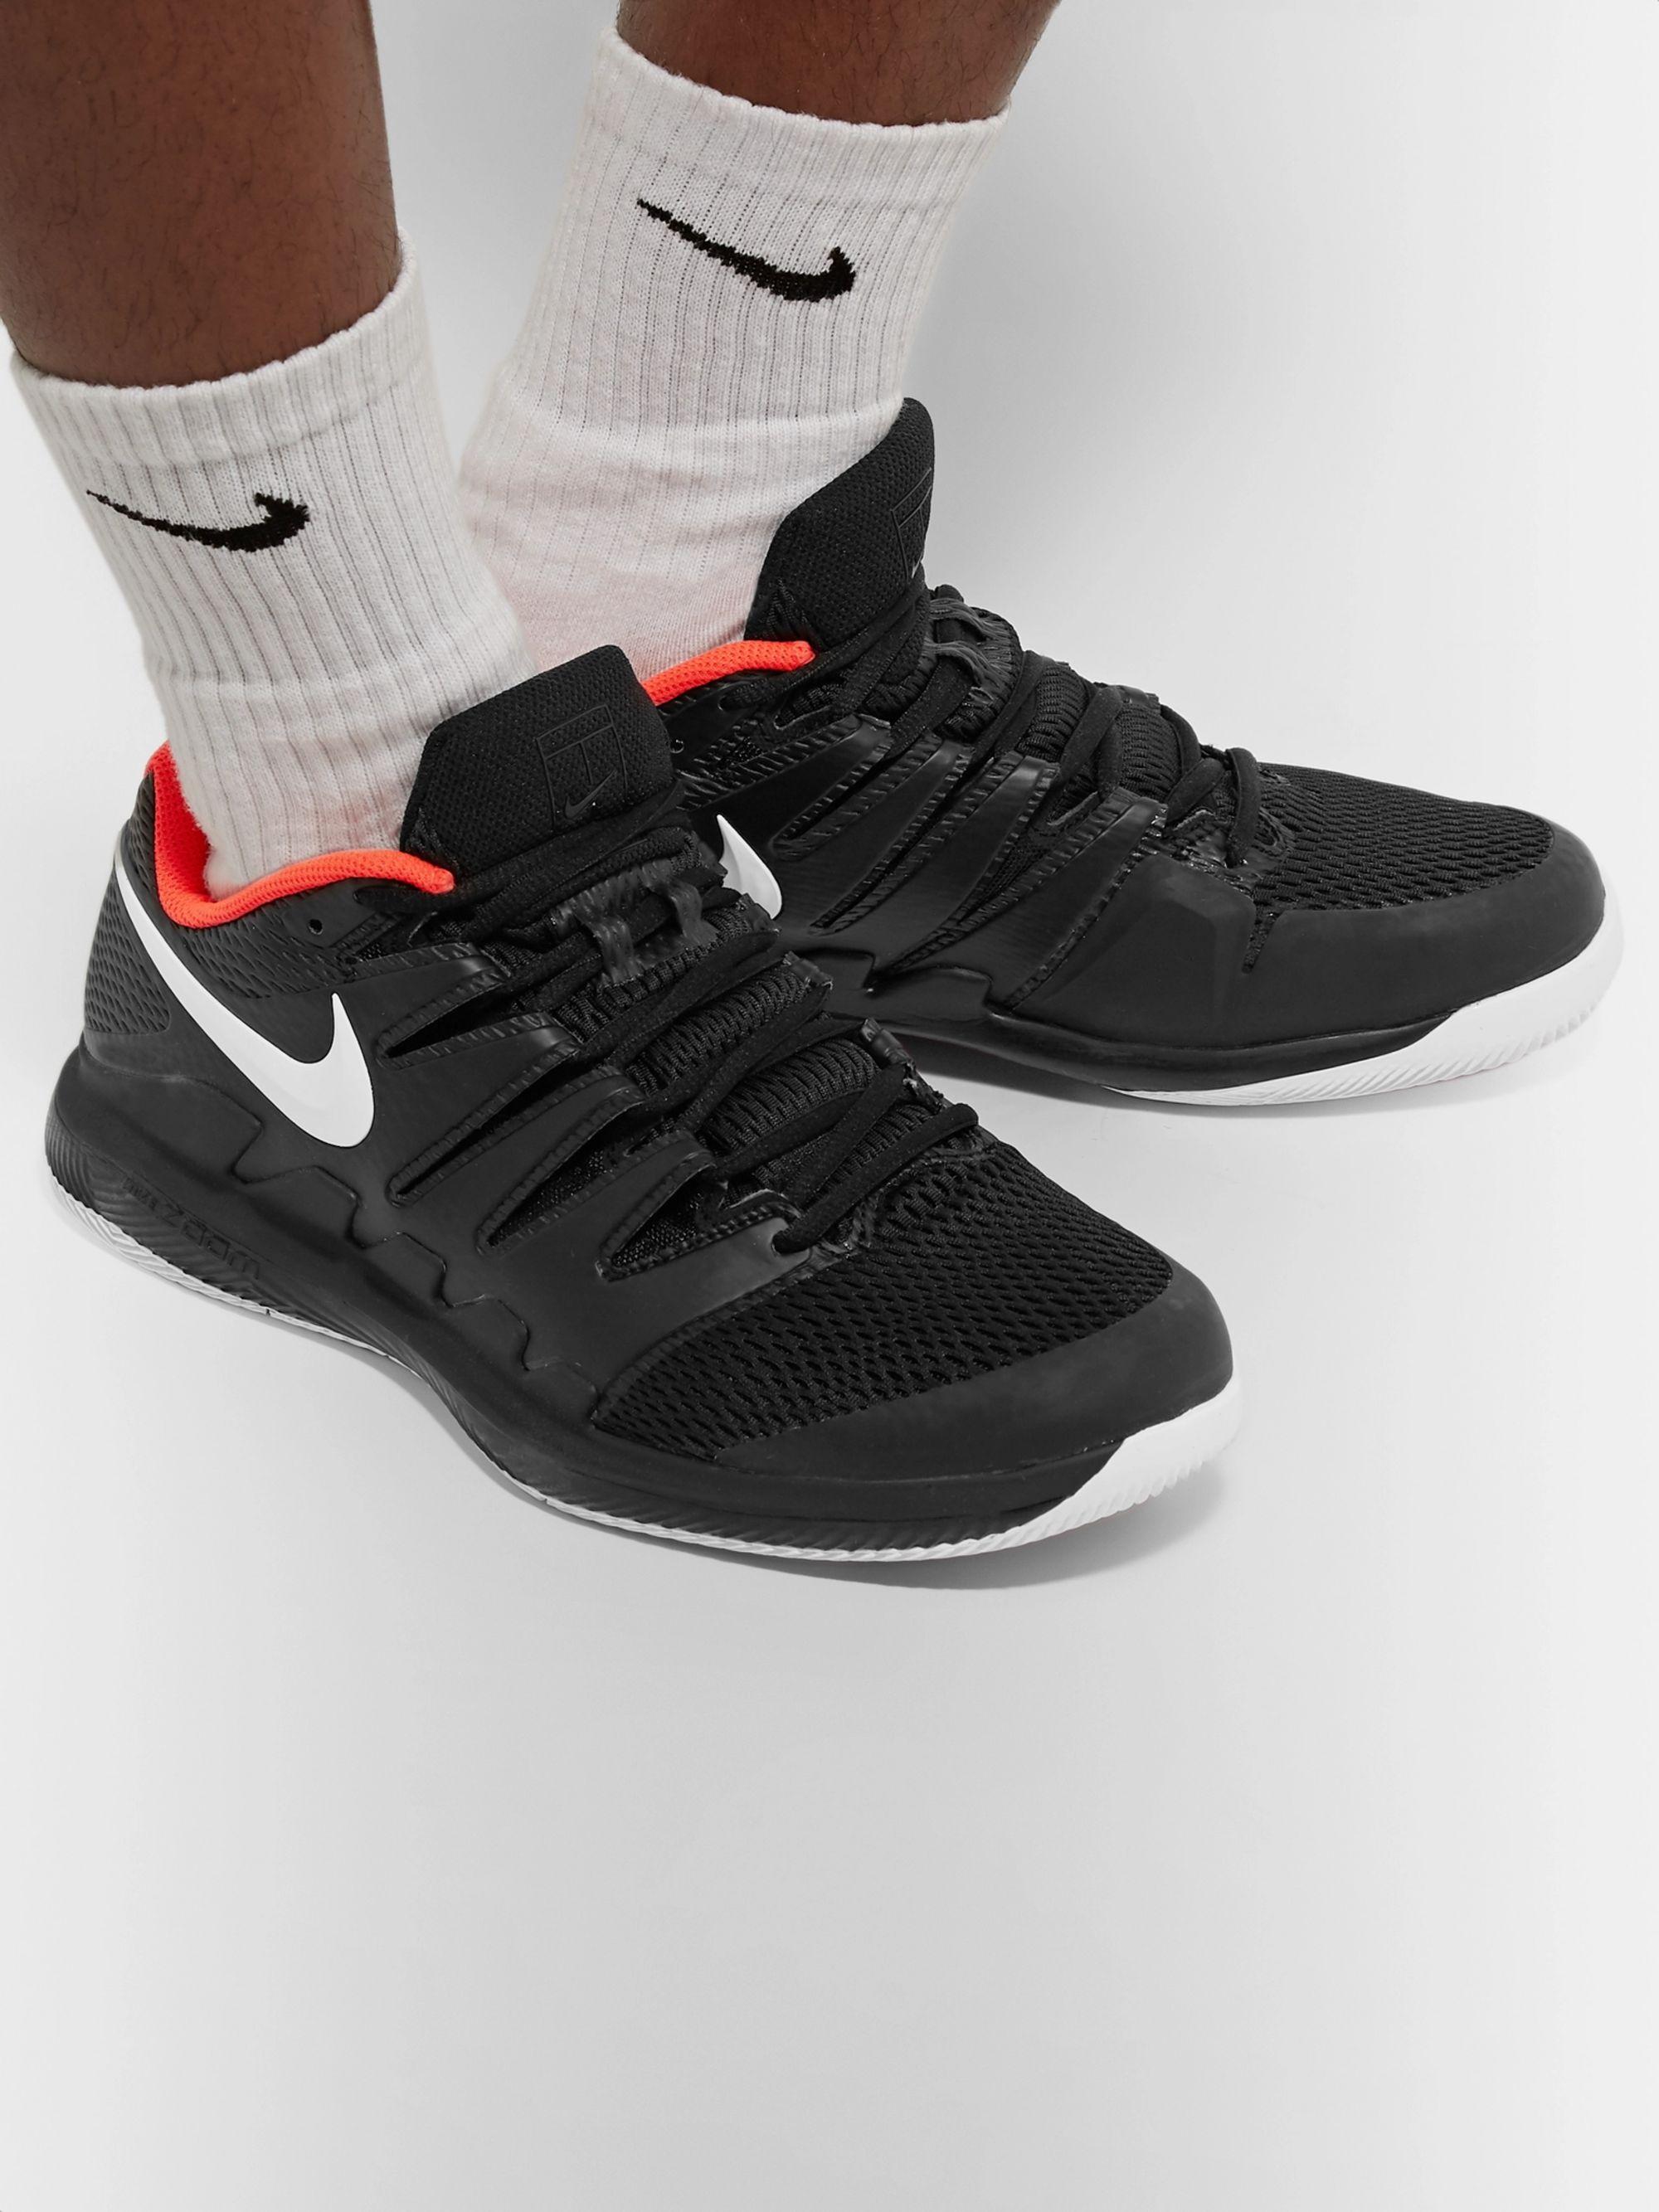 Black Air Zoom Vapor X Rubber and Mesh Tennis Sneakers